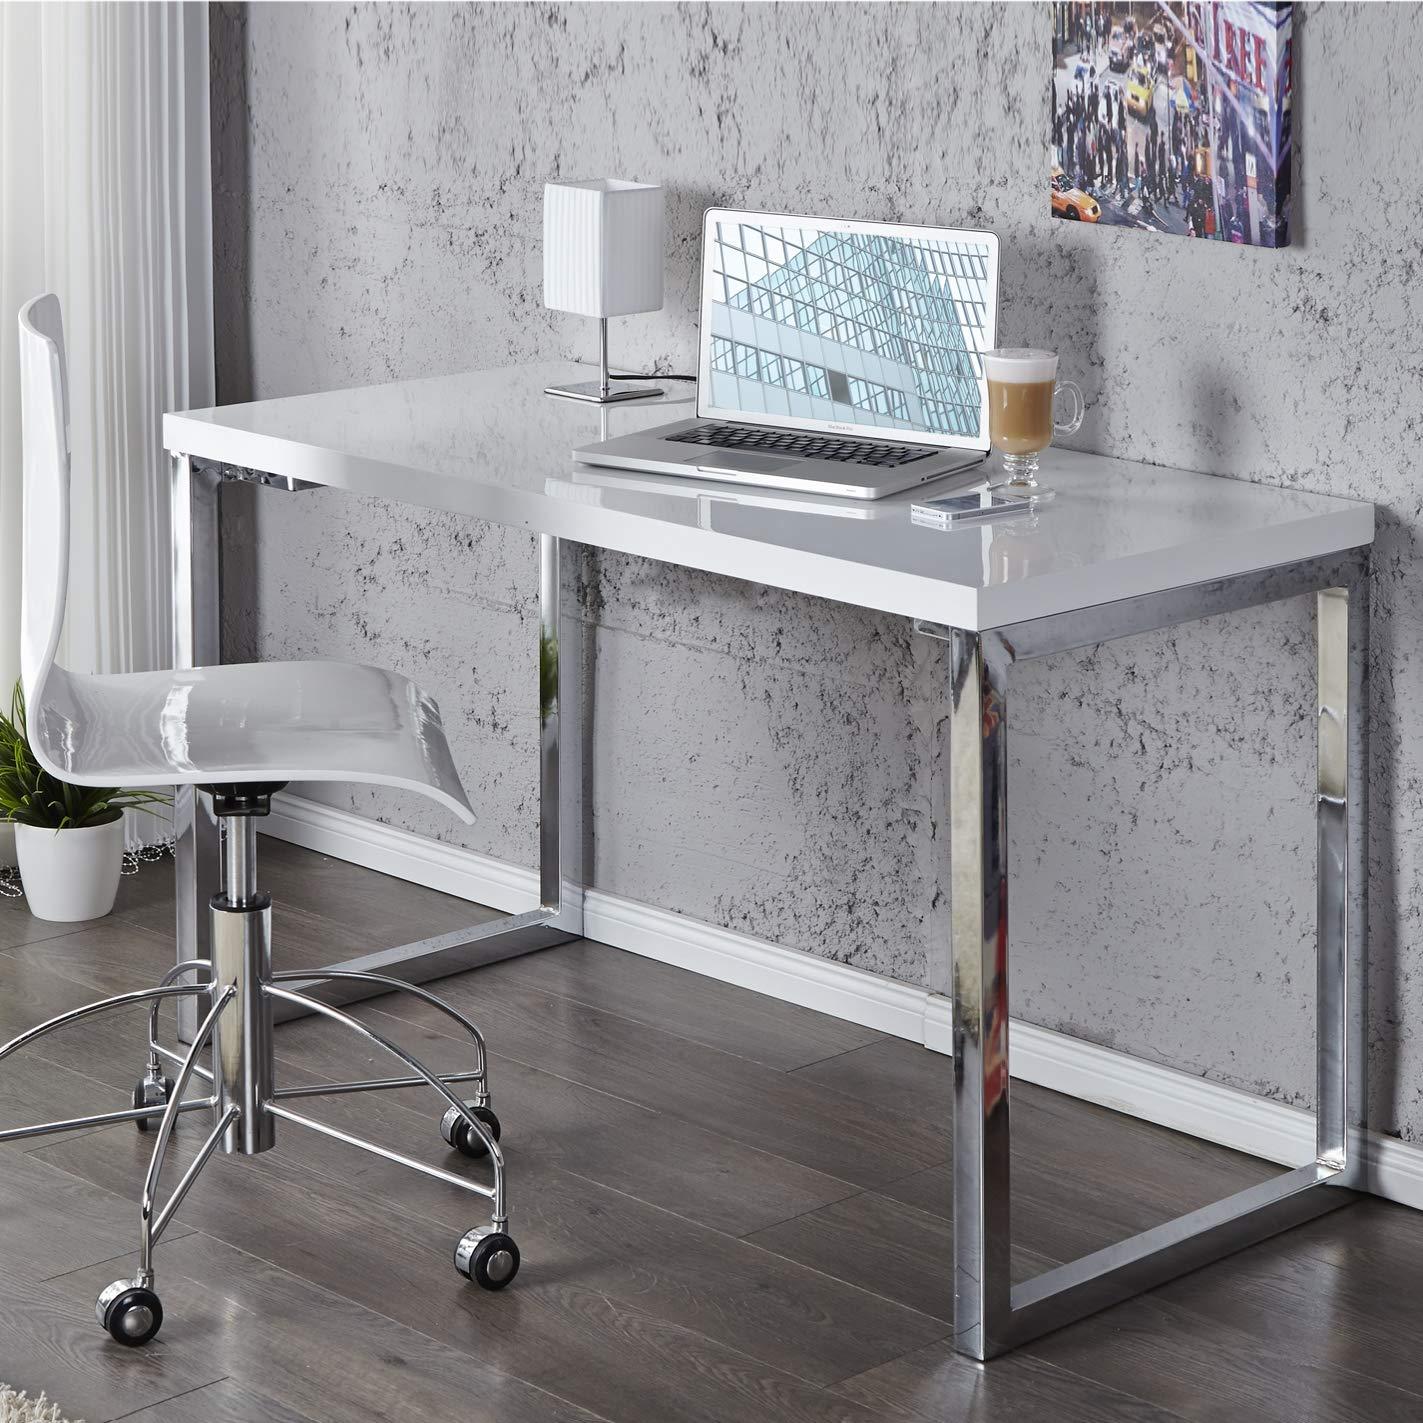 Lounge-Zone Estación de Trabajo Bauhaus Diseño Escritorio York ...